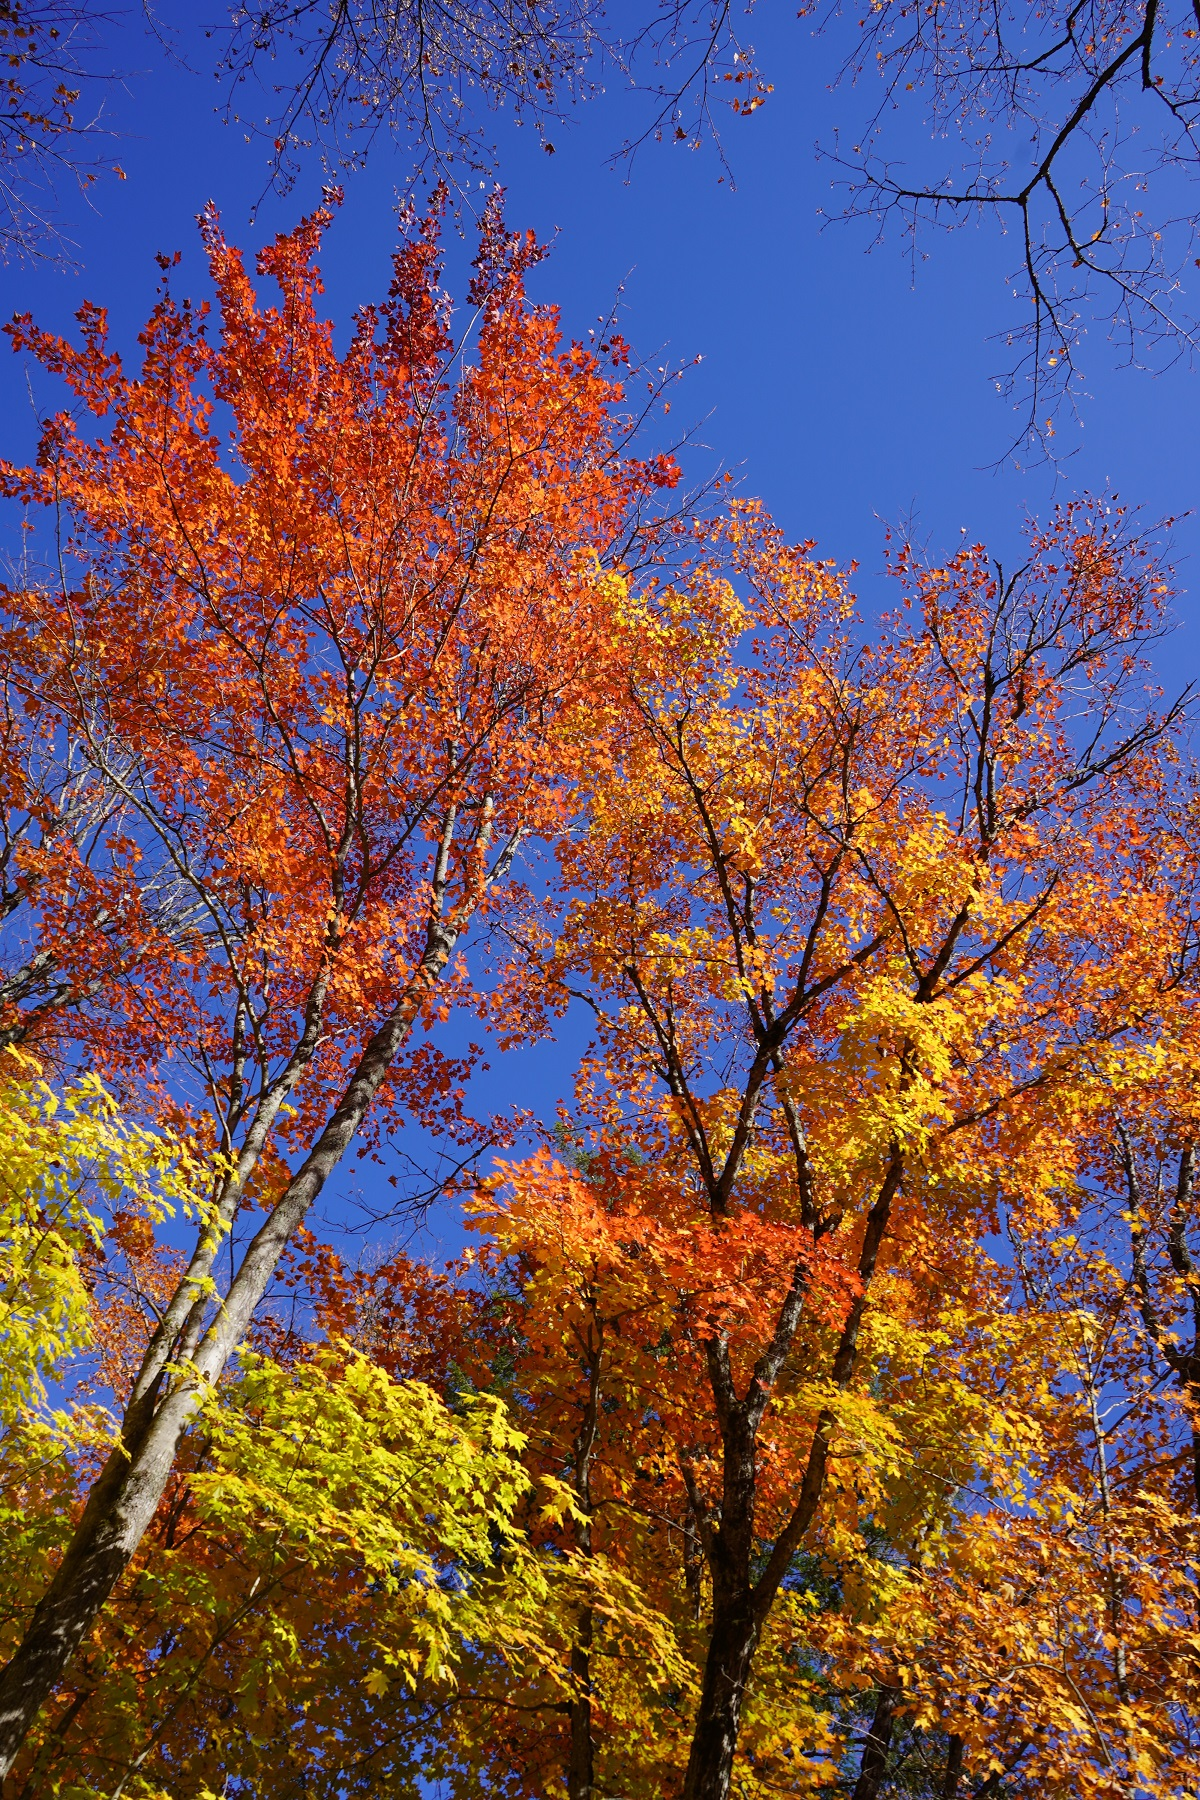 Algonquin Park, Ontario, Canada, Autumn 2019, Foliage Simergphotos